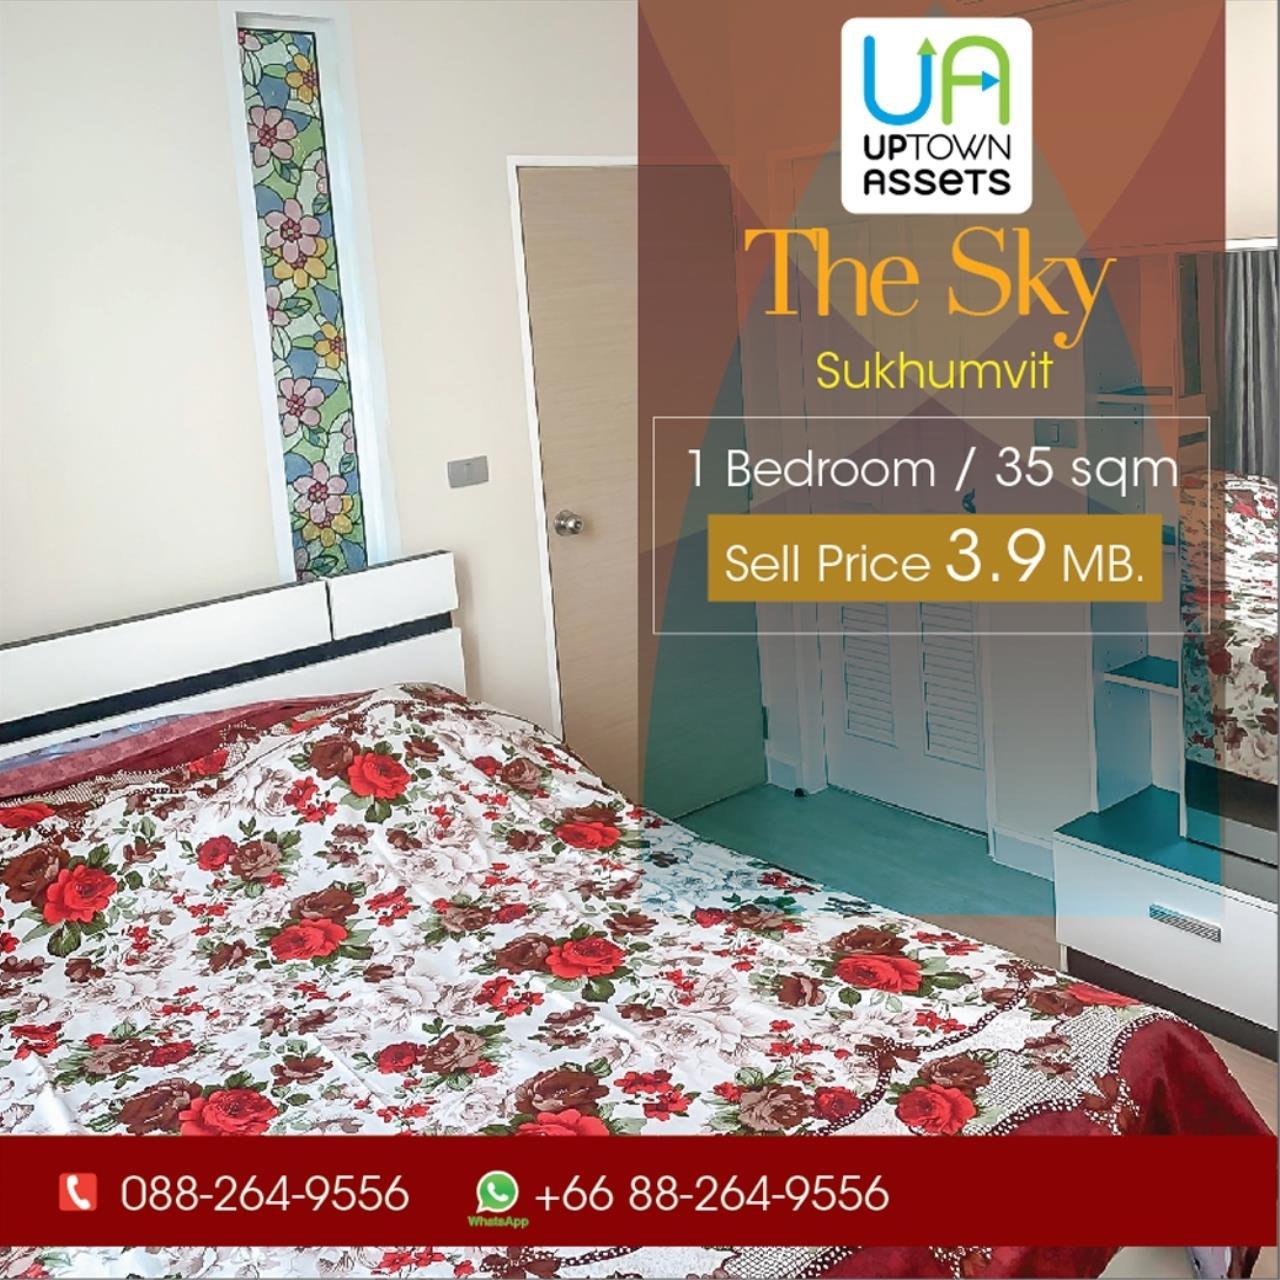 Uptown Assets  Agency's The Sky Sukhumvit  Unit 4107/157 9